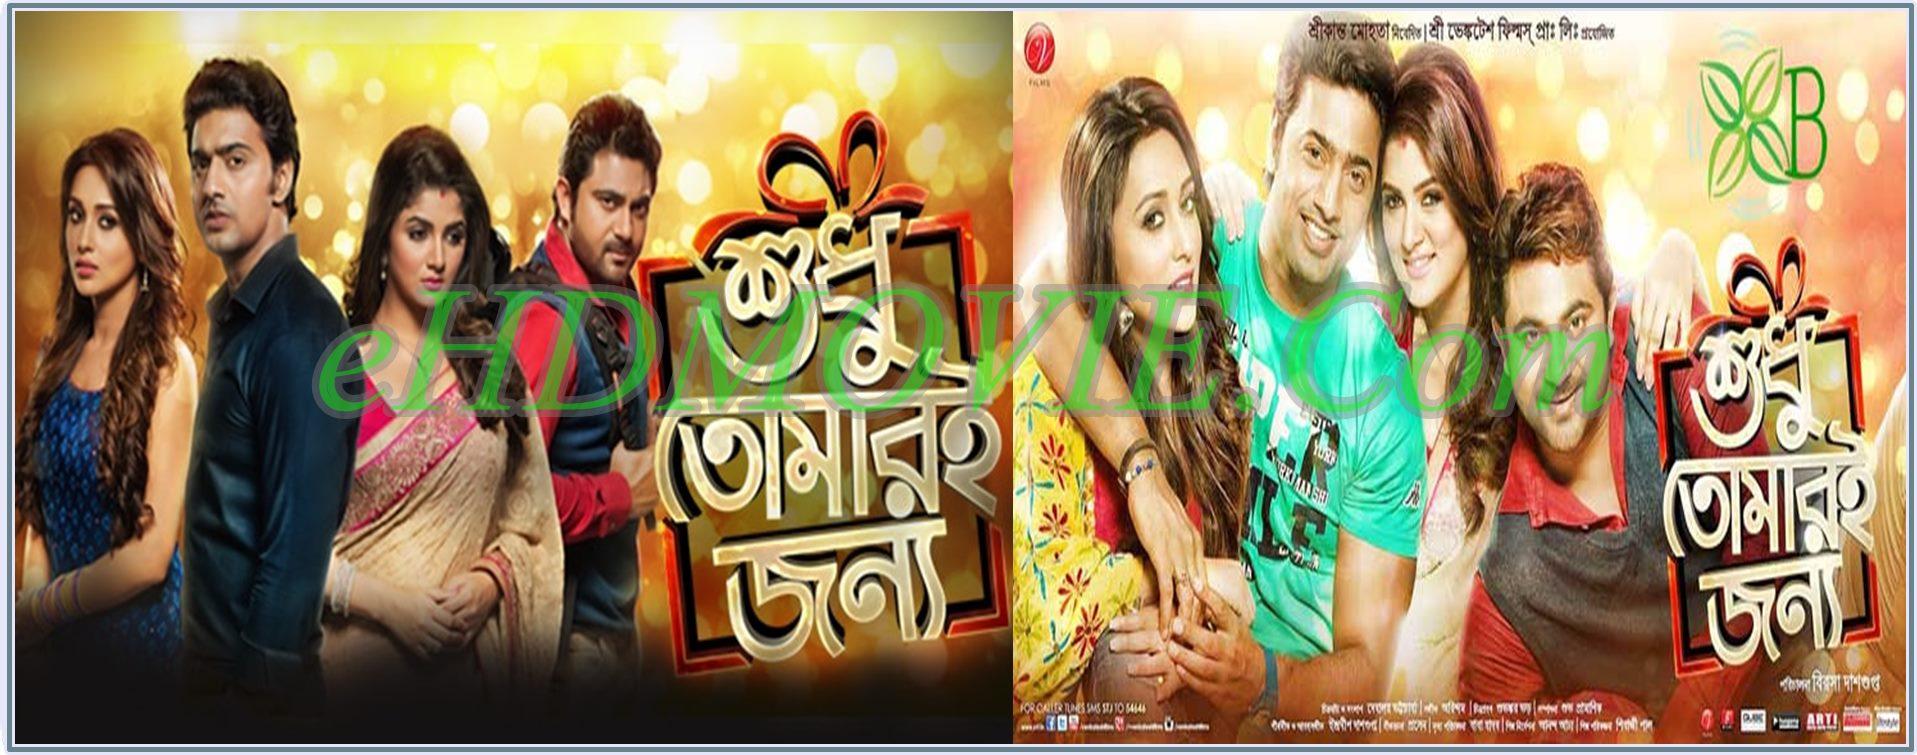 Shudhu Tomari Jonyo 2015 Bengali Full Movie Original 480p - 720p ORG WEB-DL 600MB - 1.6GB